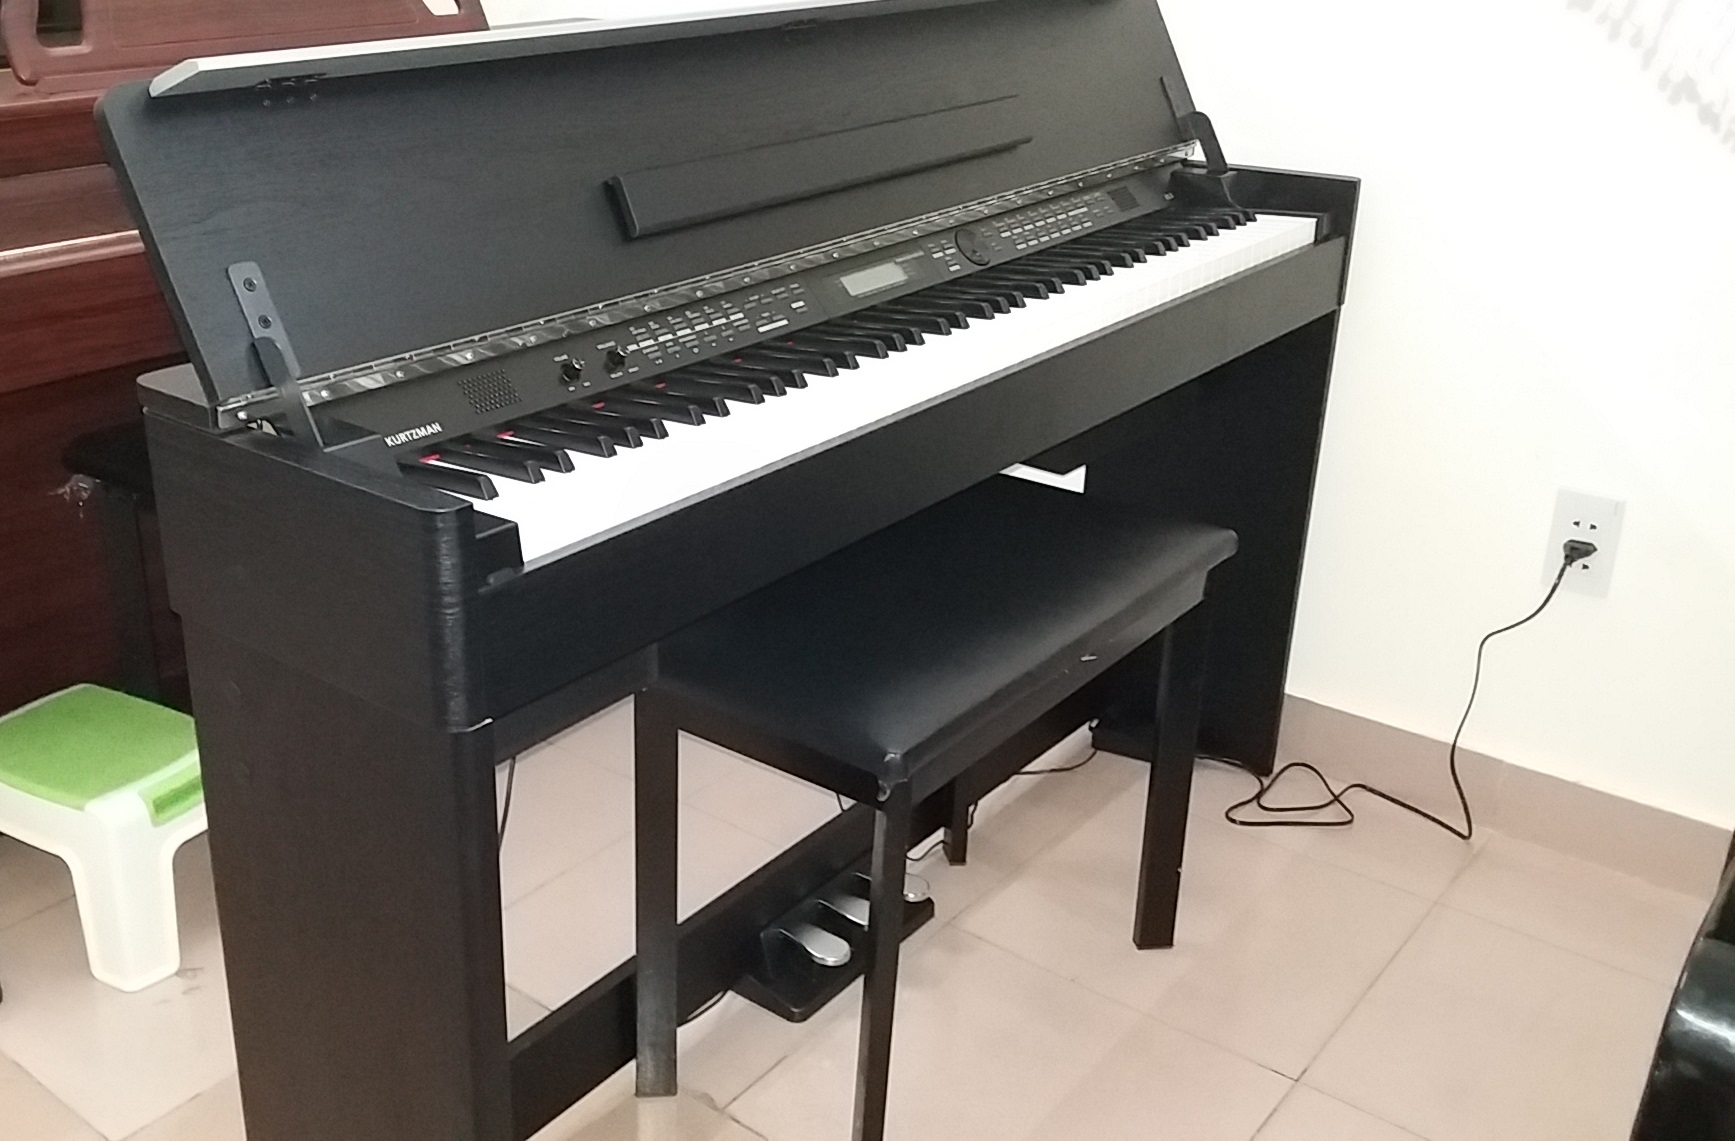 Đàn piano điện tử Kurtzman KS3